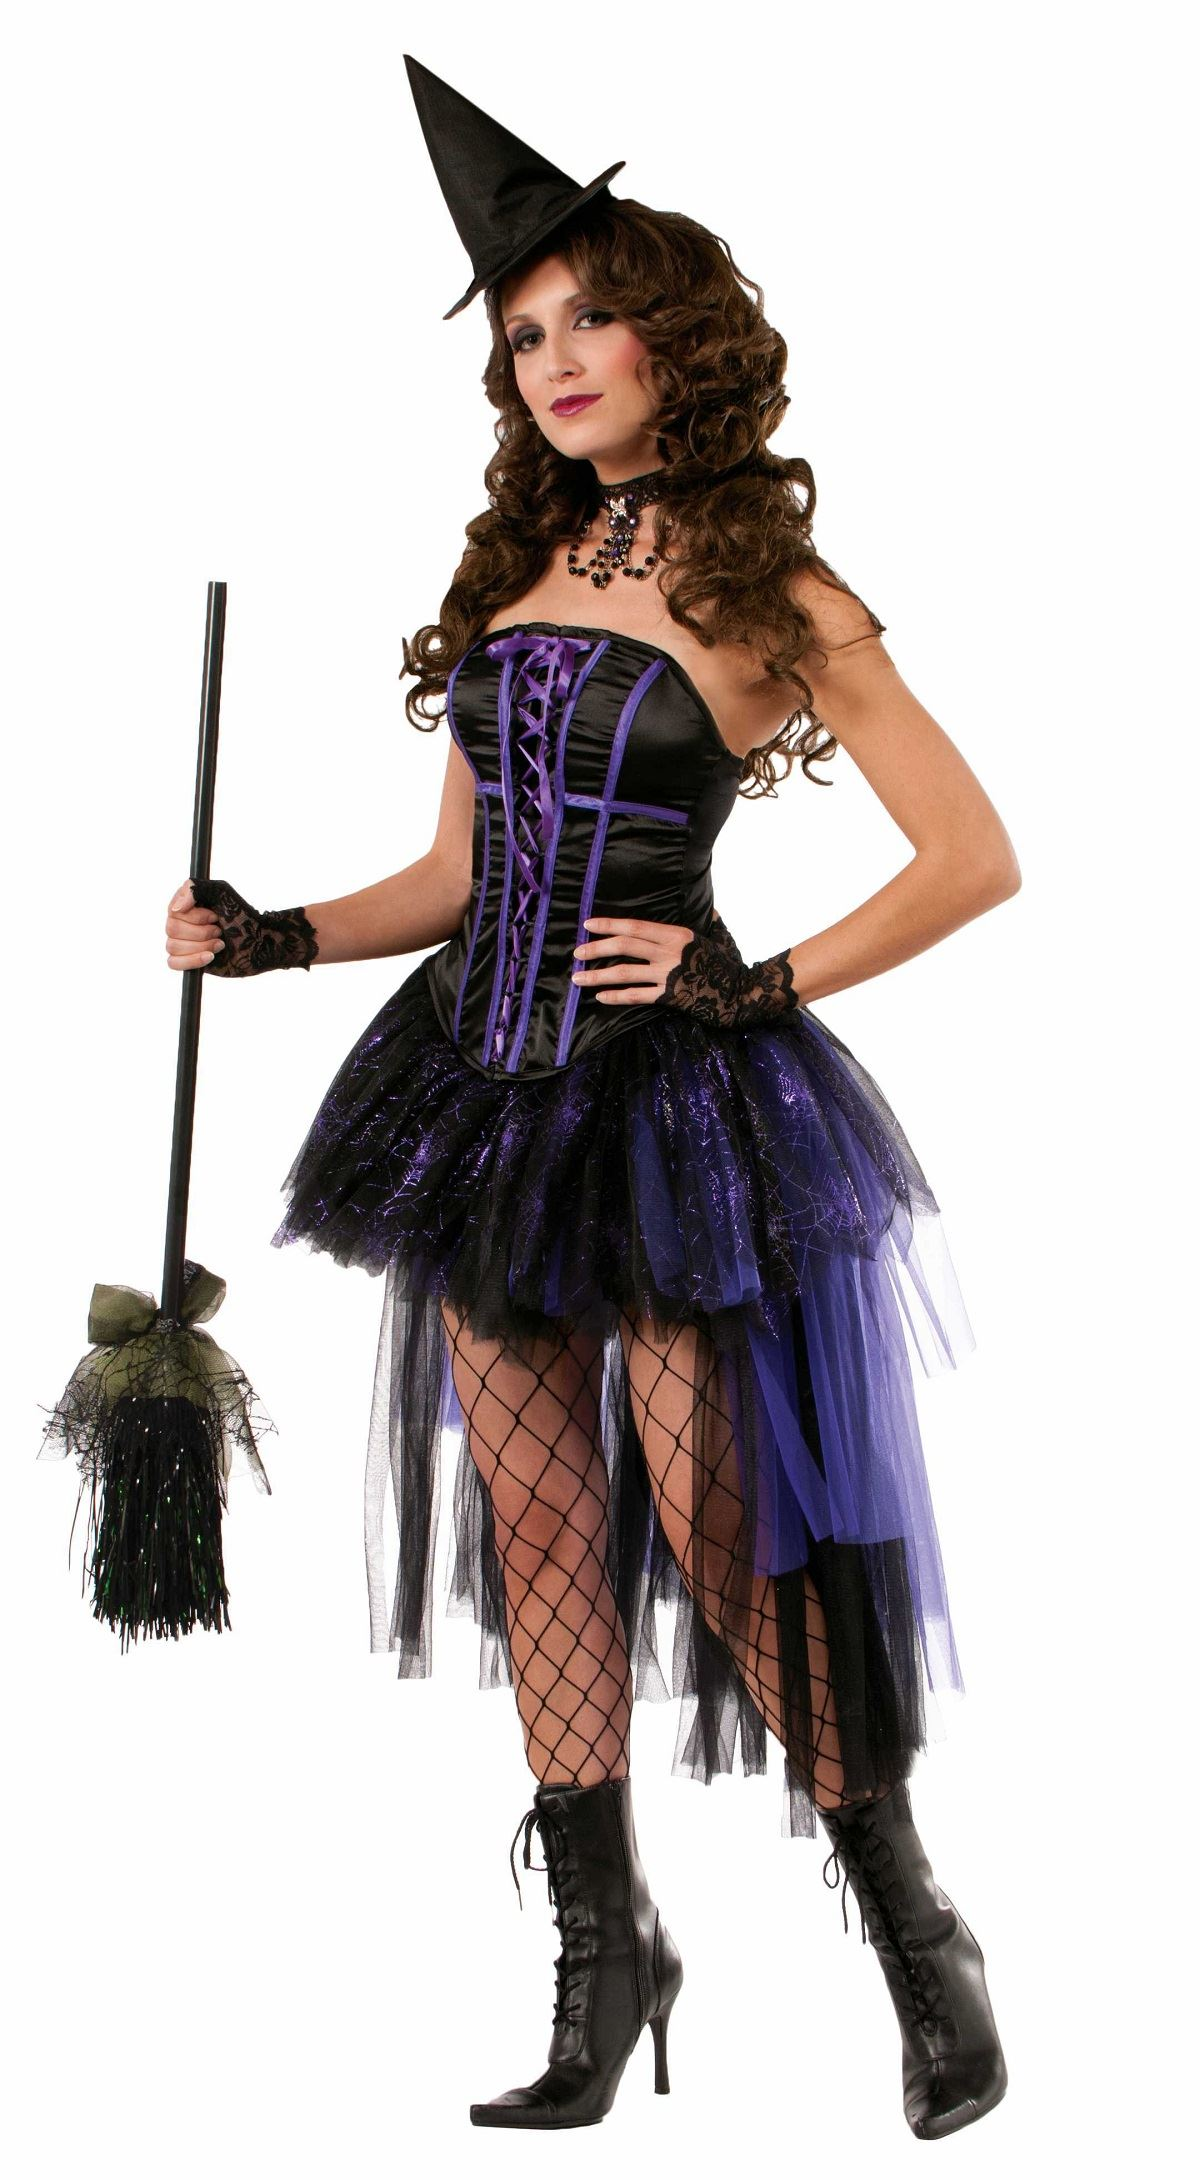 Costume porno halloween